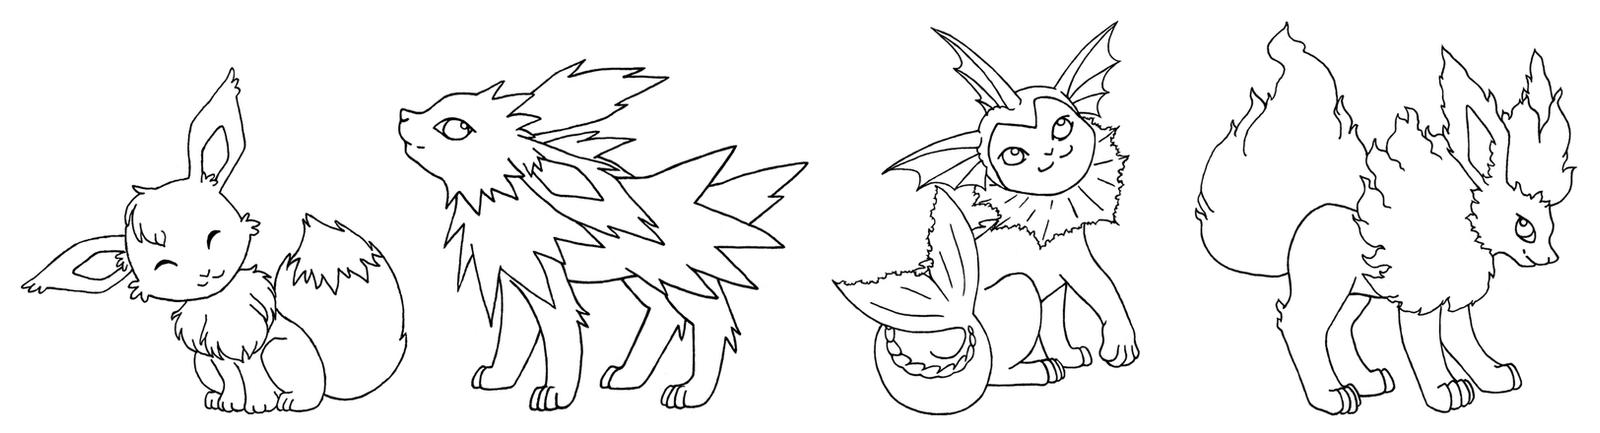 Pokemon- Eevee + basic evols by ImaginaryFox